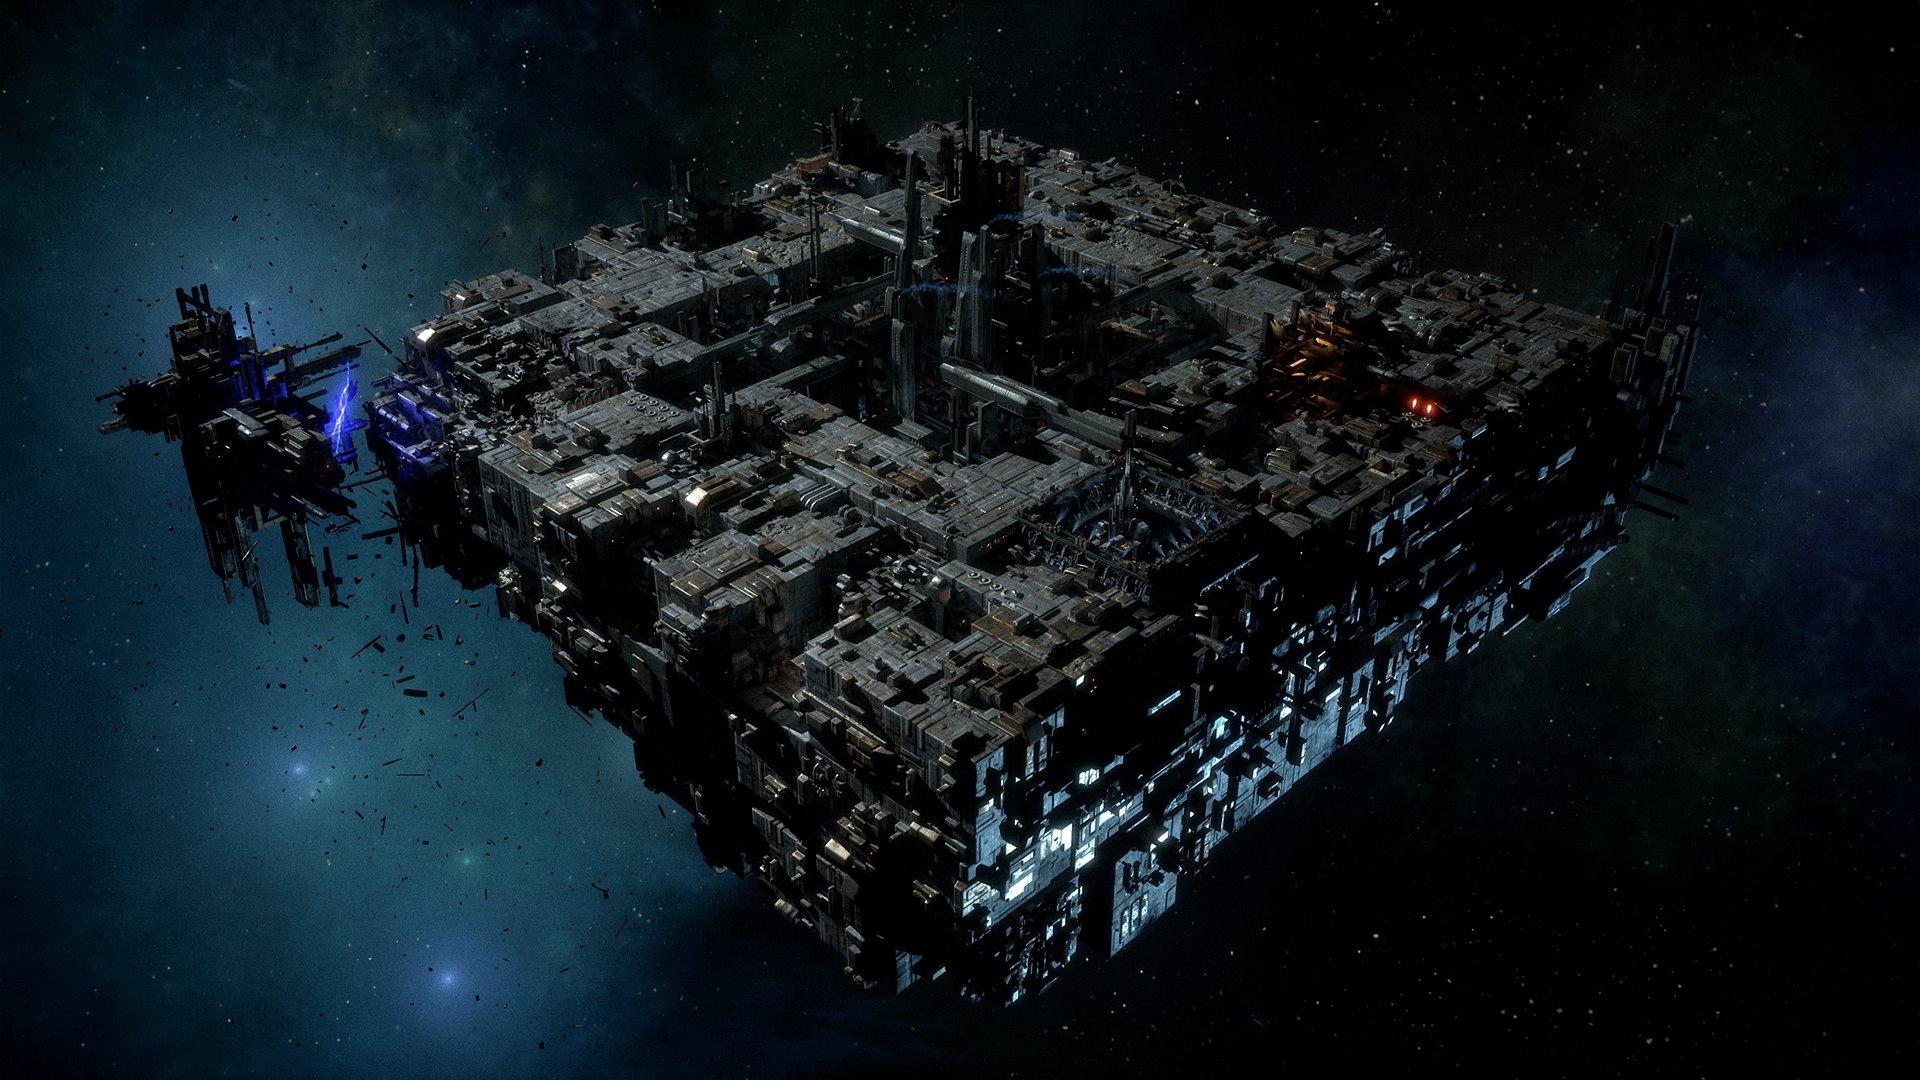 Insomnia: The Ark Screenshot 2 - Bilderquelle: HeroCraft